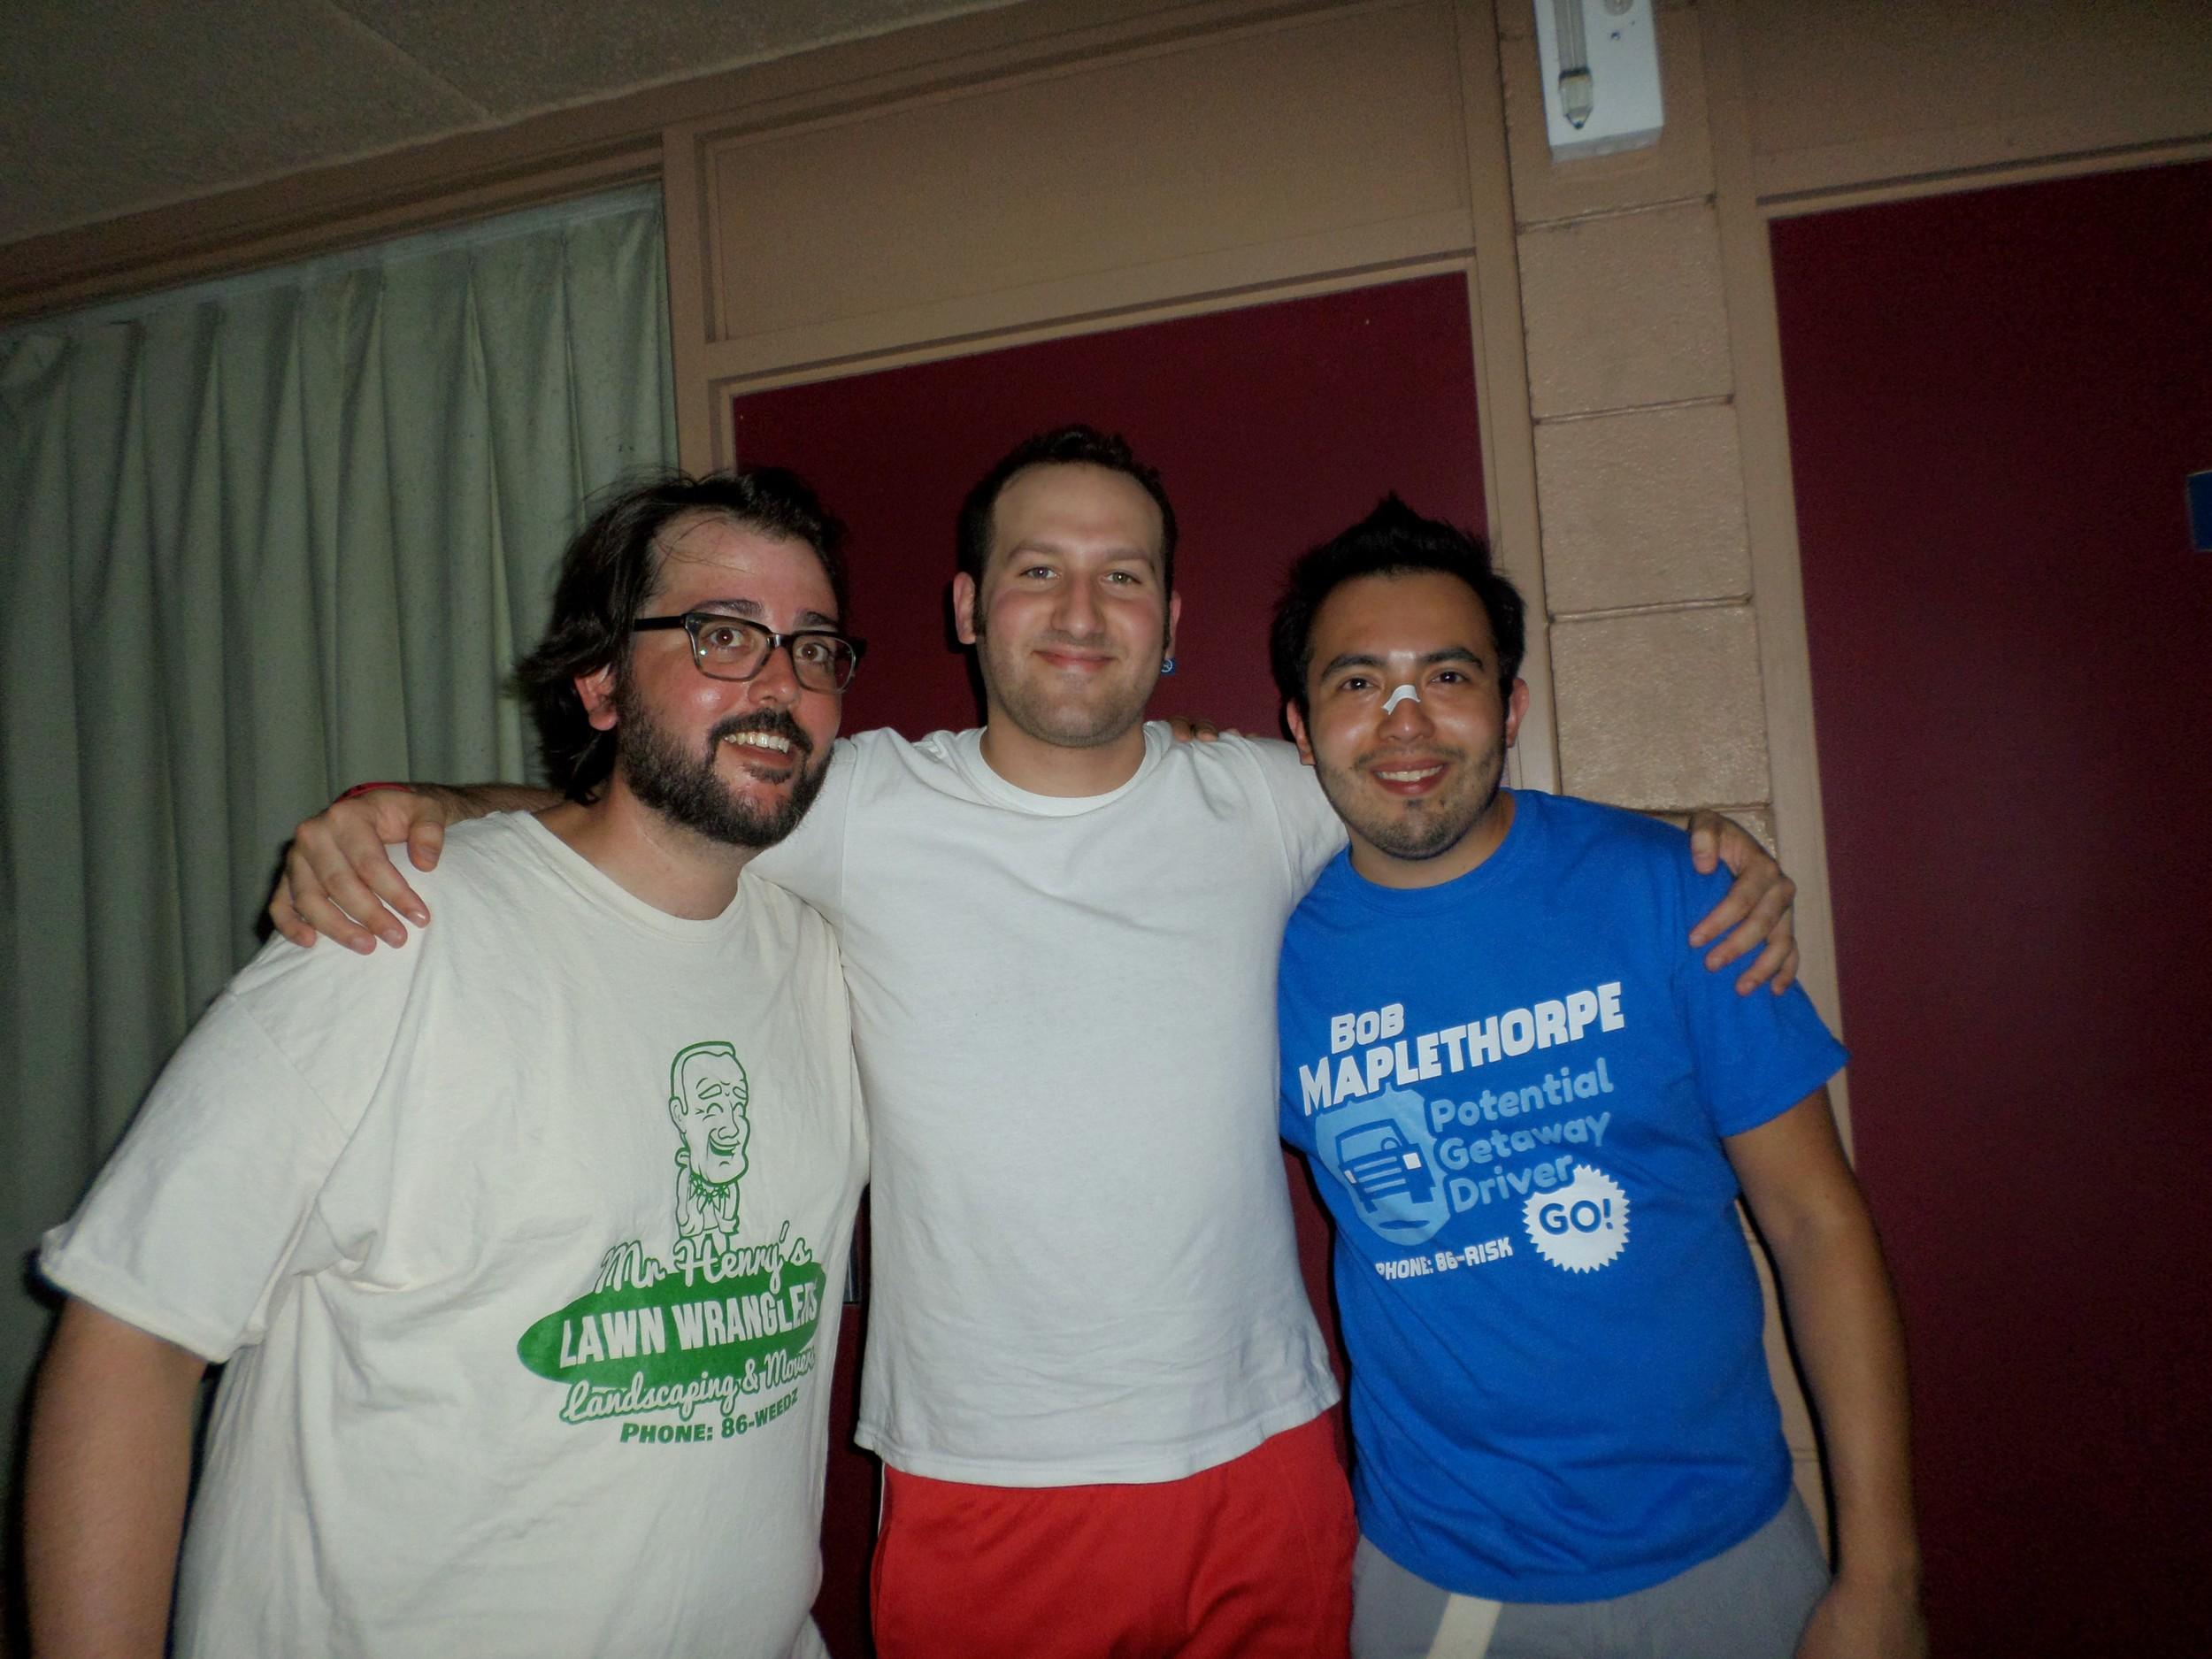 Chris and Andy with Matt Reuber